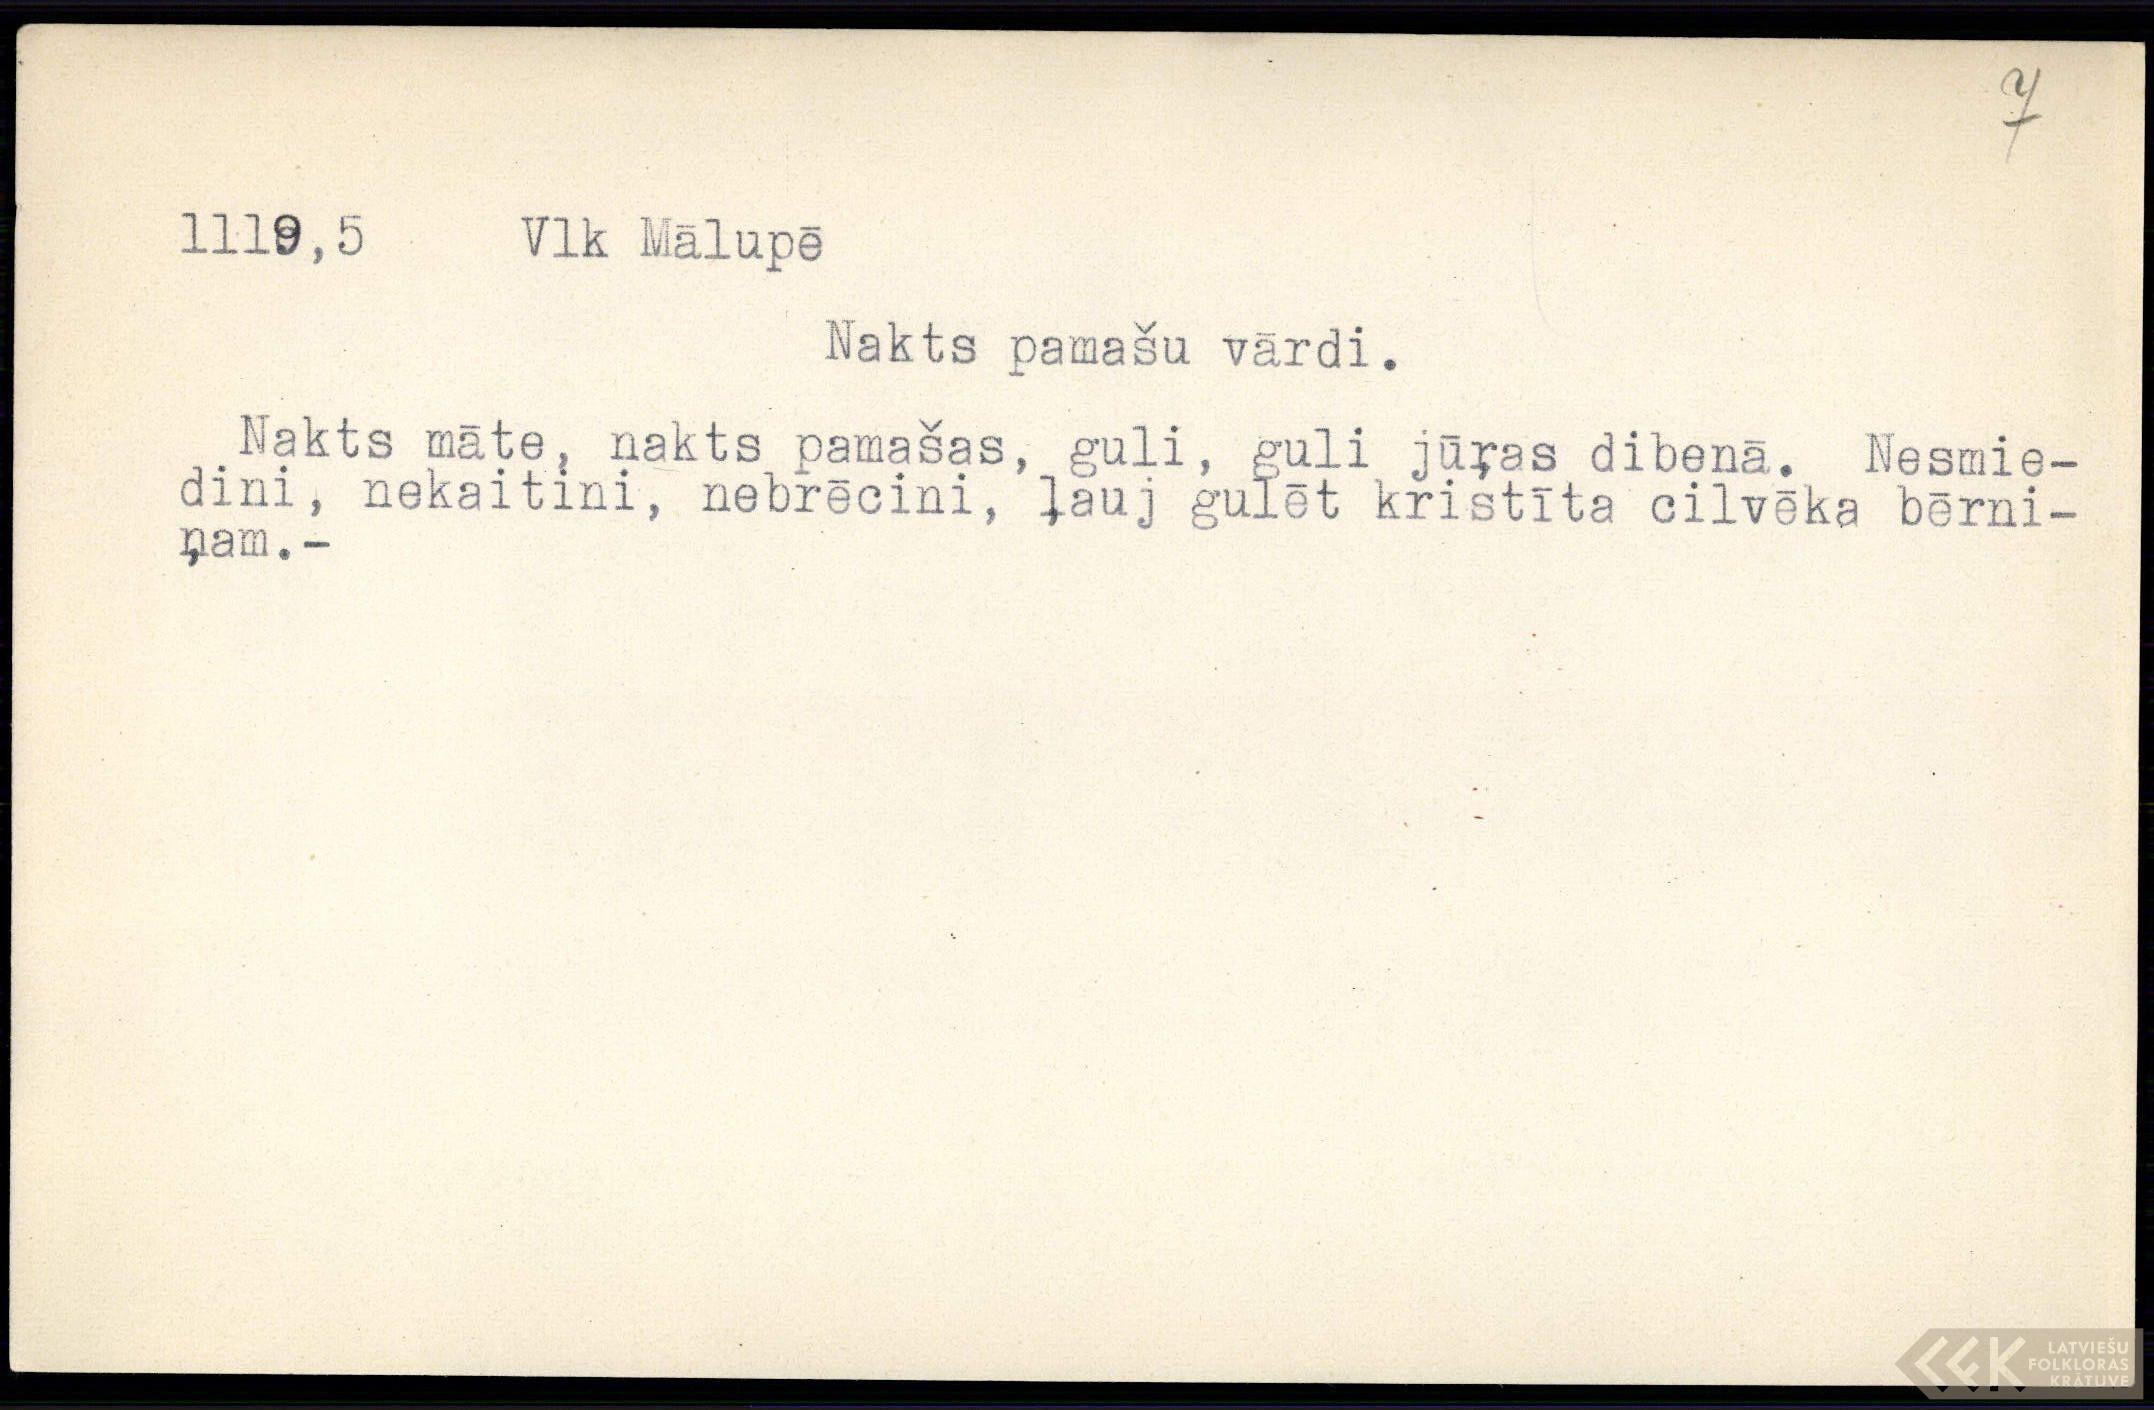 LFK-1119-00005-buramvardu-kartoteka